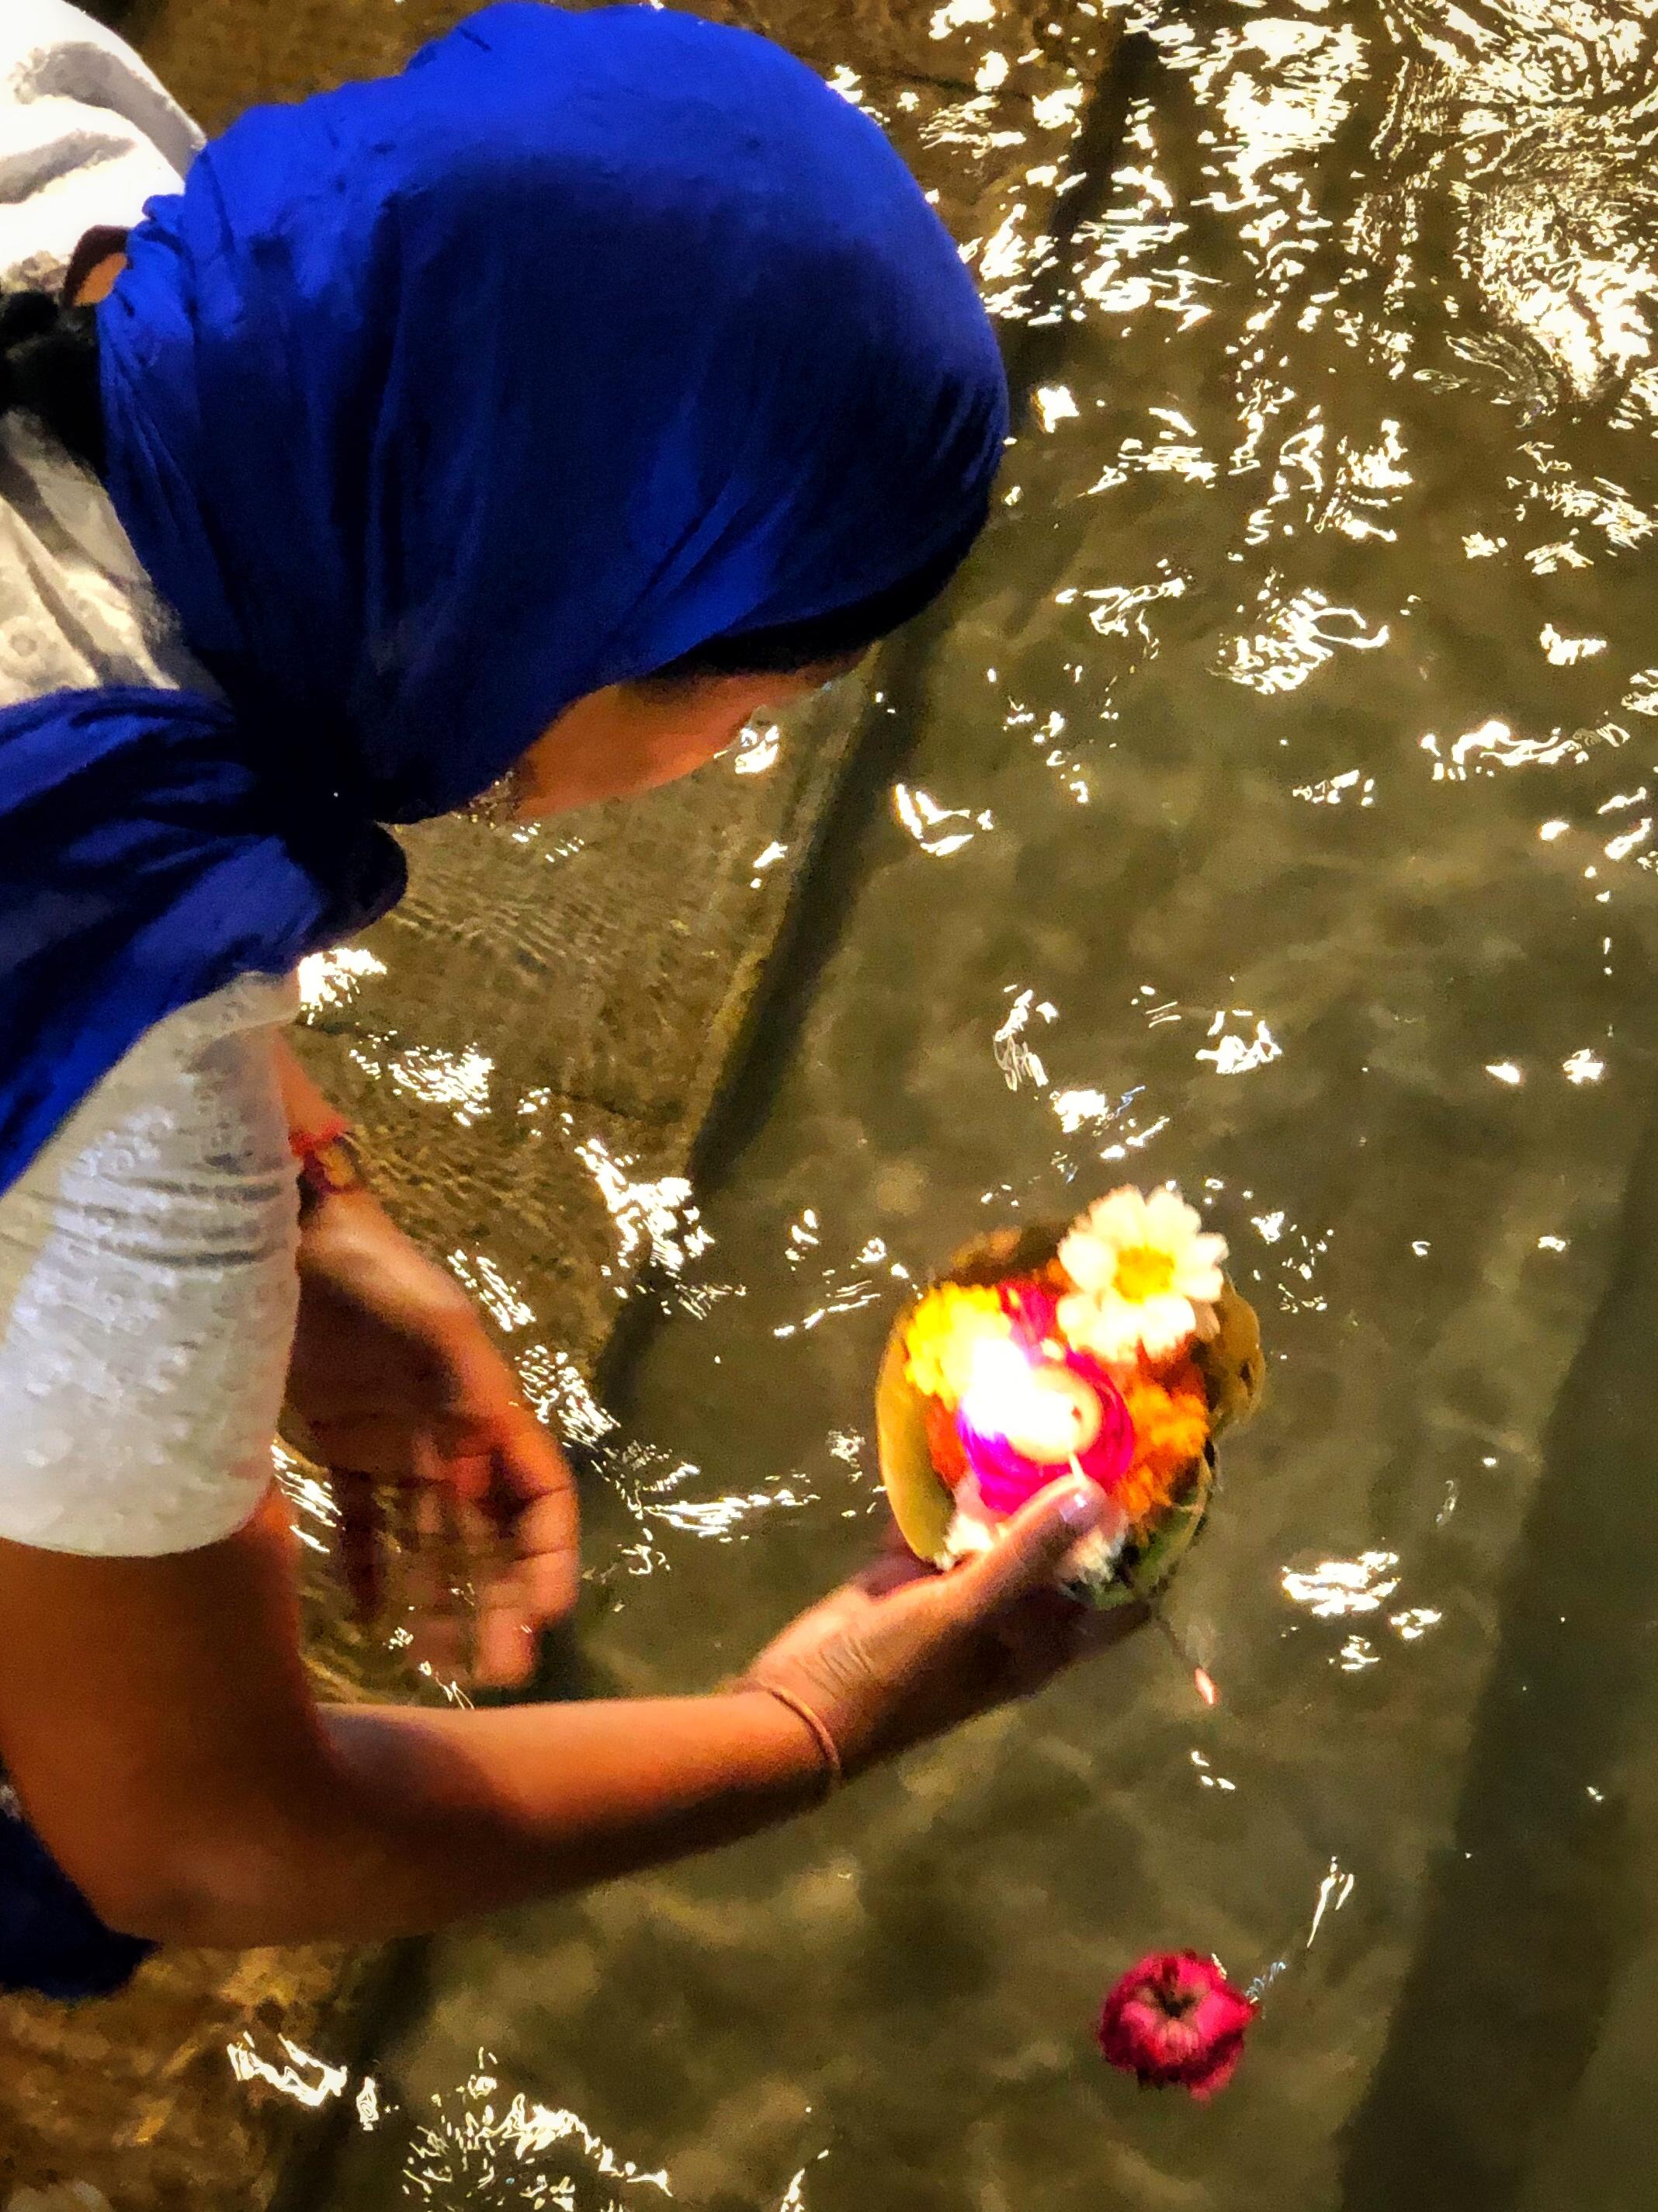 Ganges prayer ritual